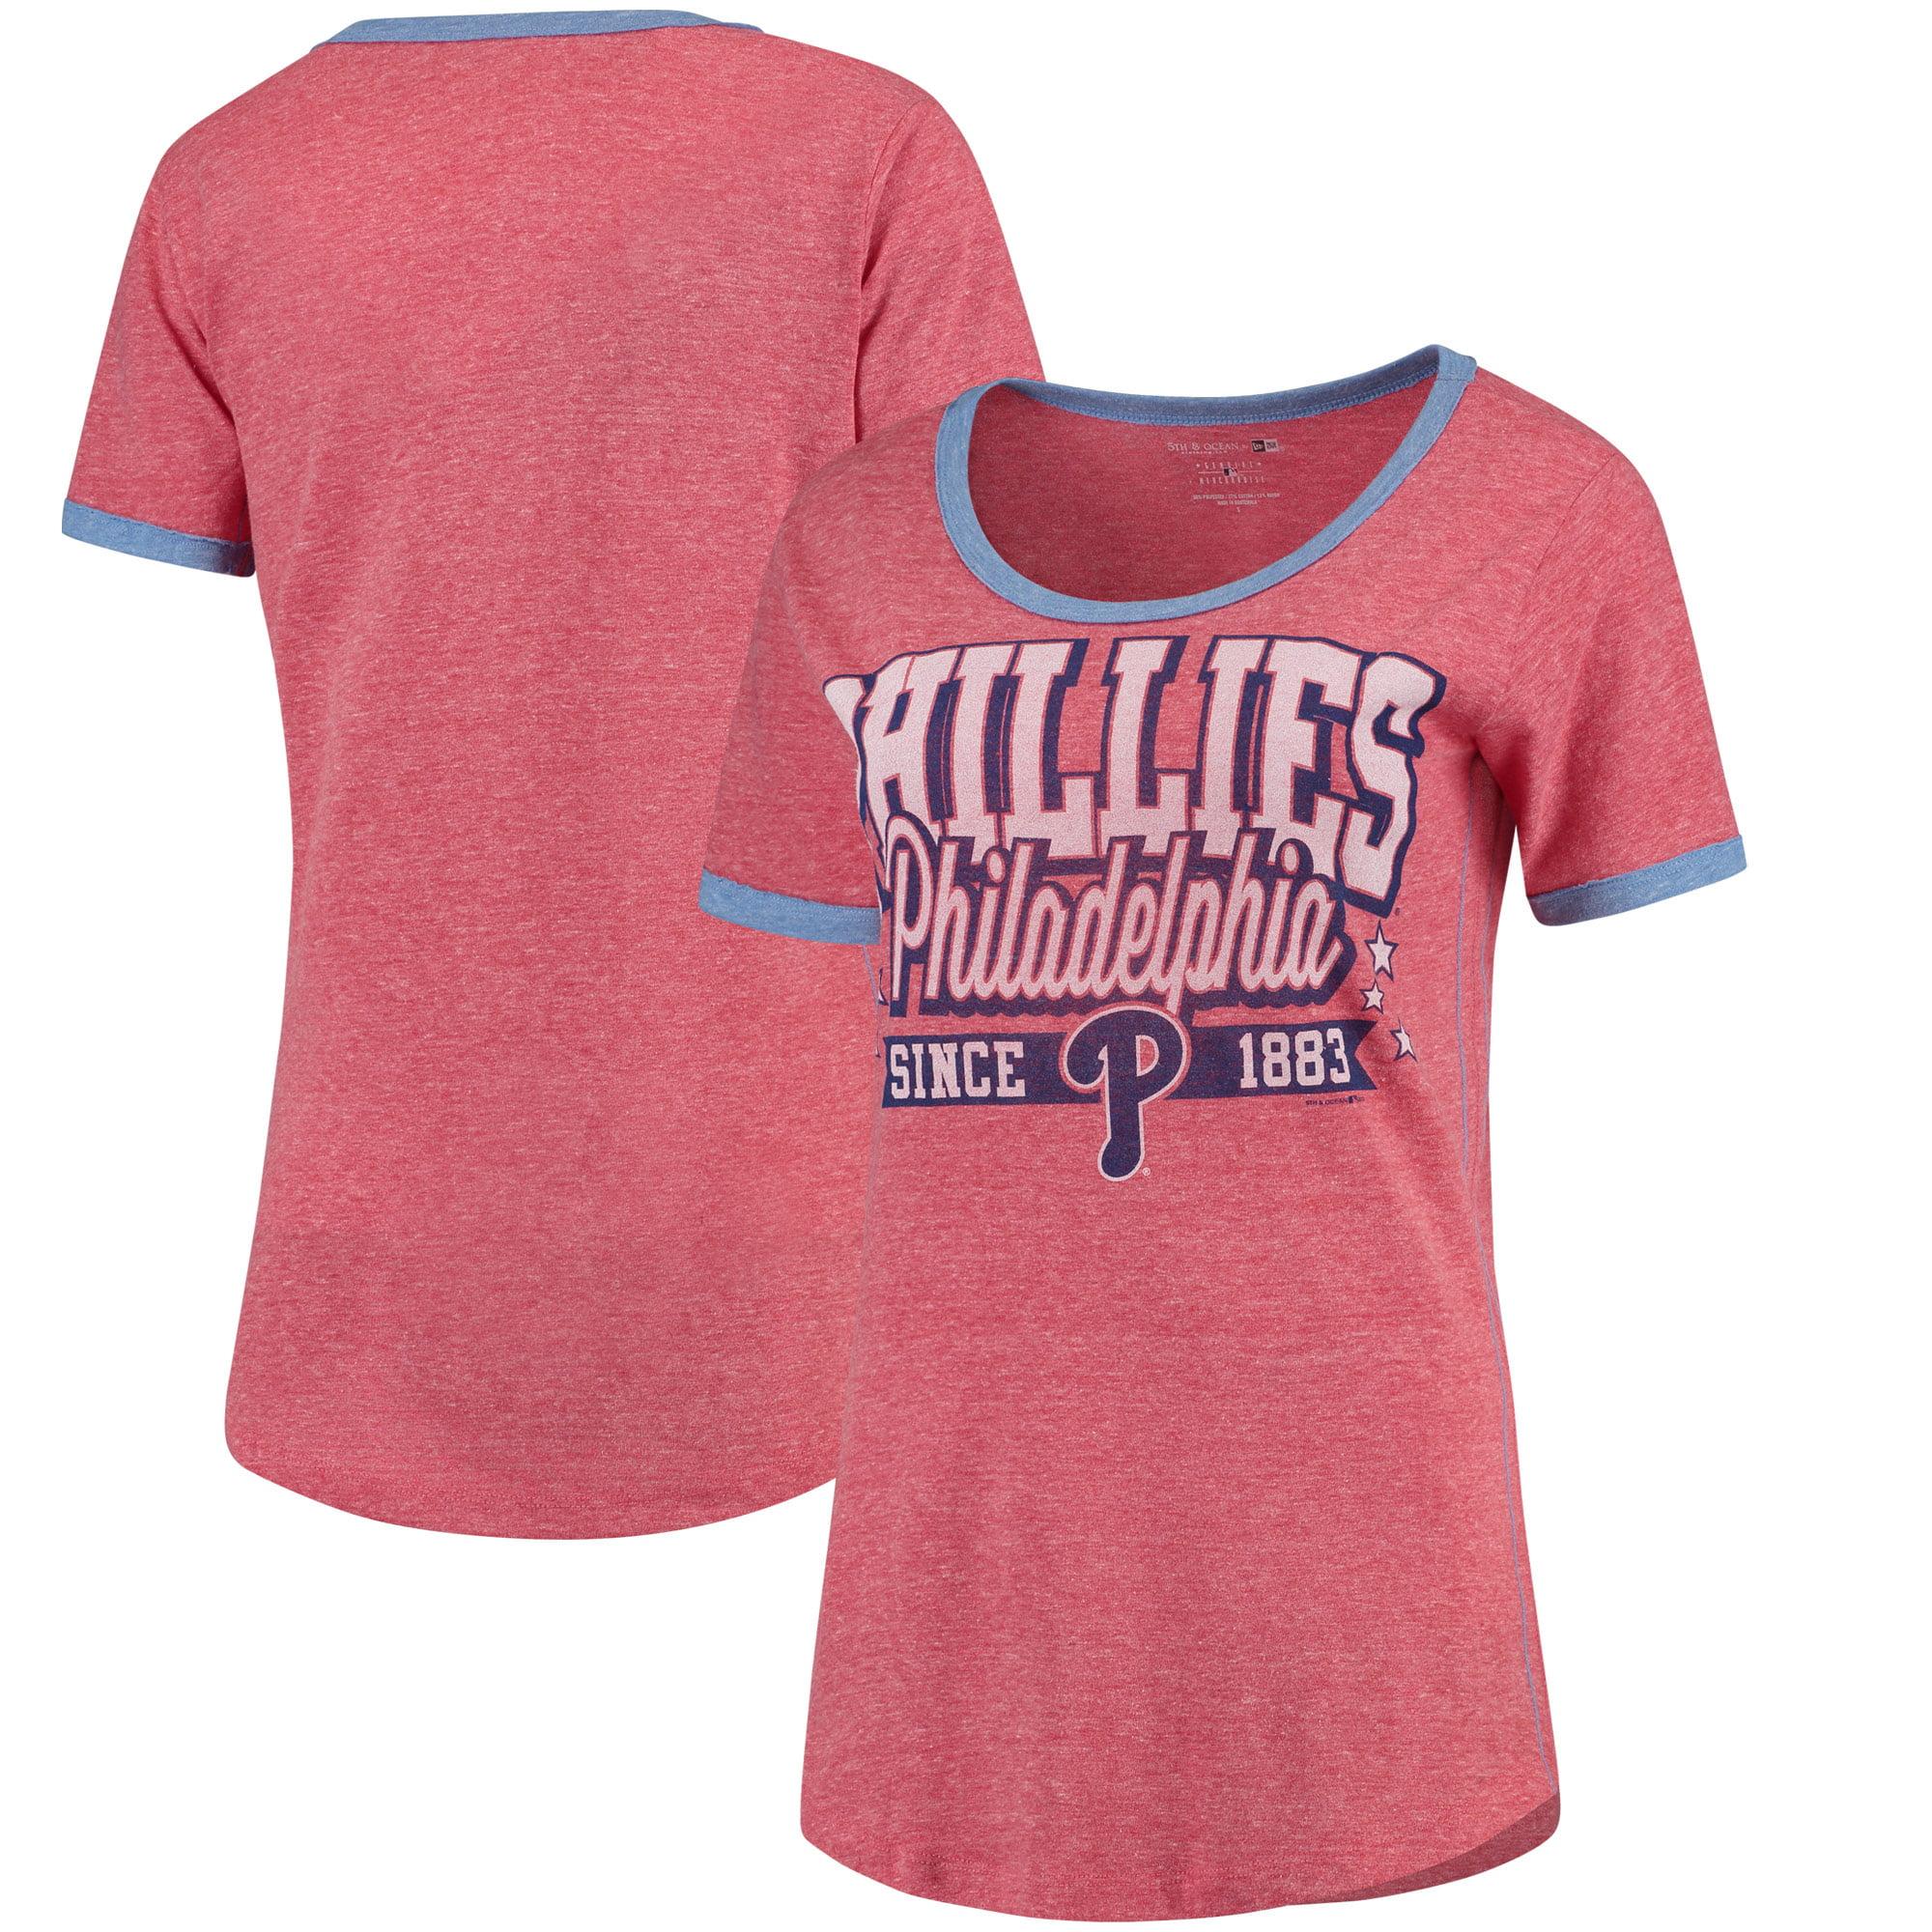 Philadelphia Phillies 5th & Ocean by New Era Women's Jersey Ringer Tri-Blend T-Shirt - Red/Royal